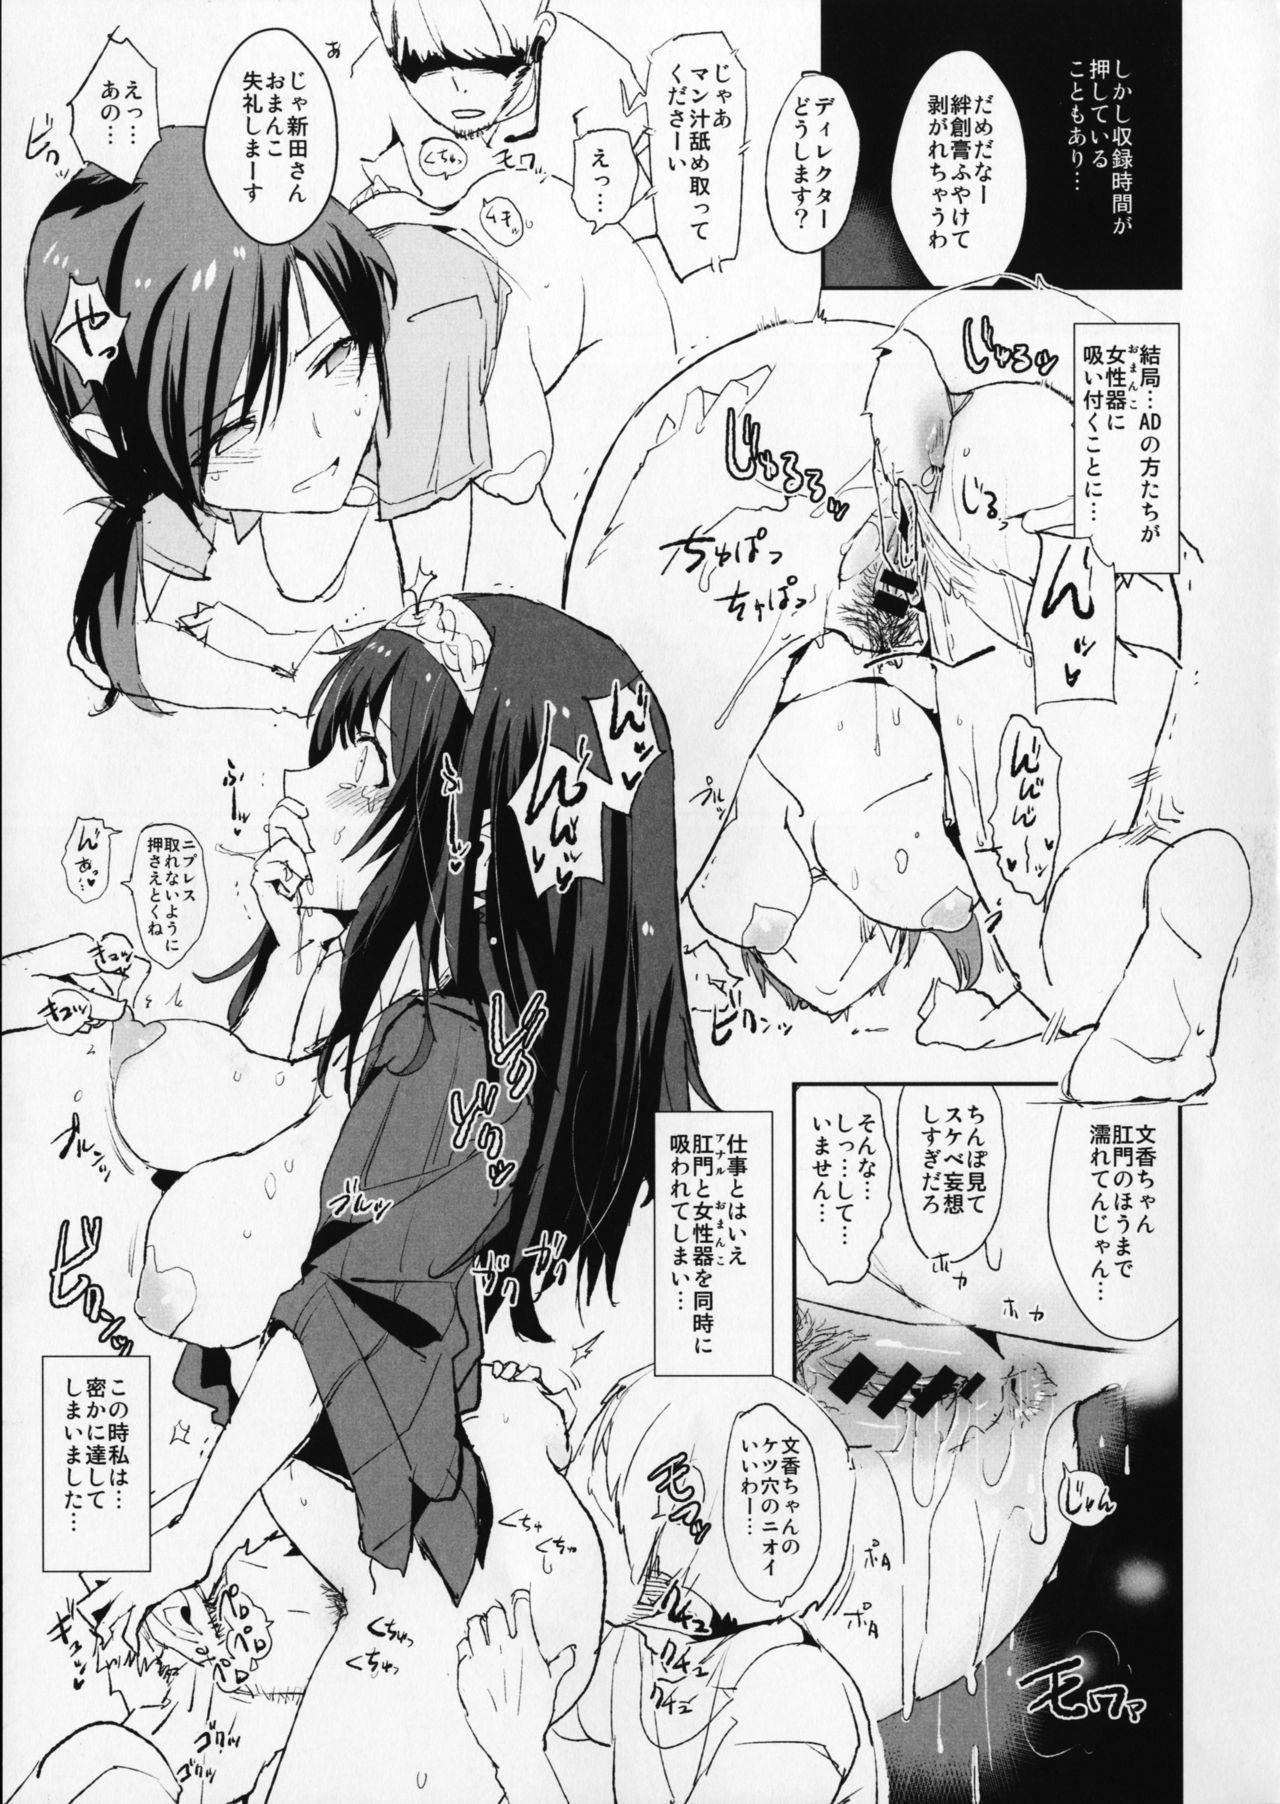 (C91) [Yami ni Ugomeku (Dokurosan)] Sagisawa Fumika no Saimin Dosukebe Kansoubun (with Nitta Minami) + Omake Paper (THE IDOLM@STER CINDERELLA GIRLS) 7